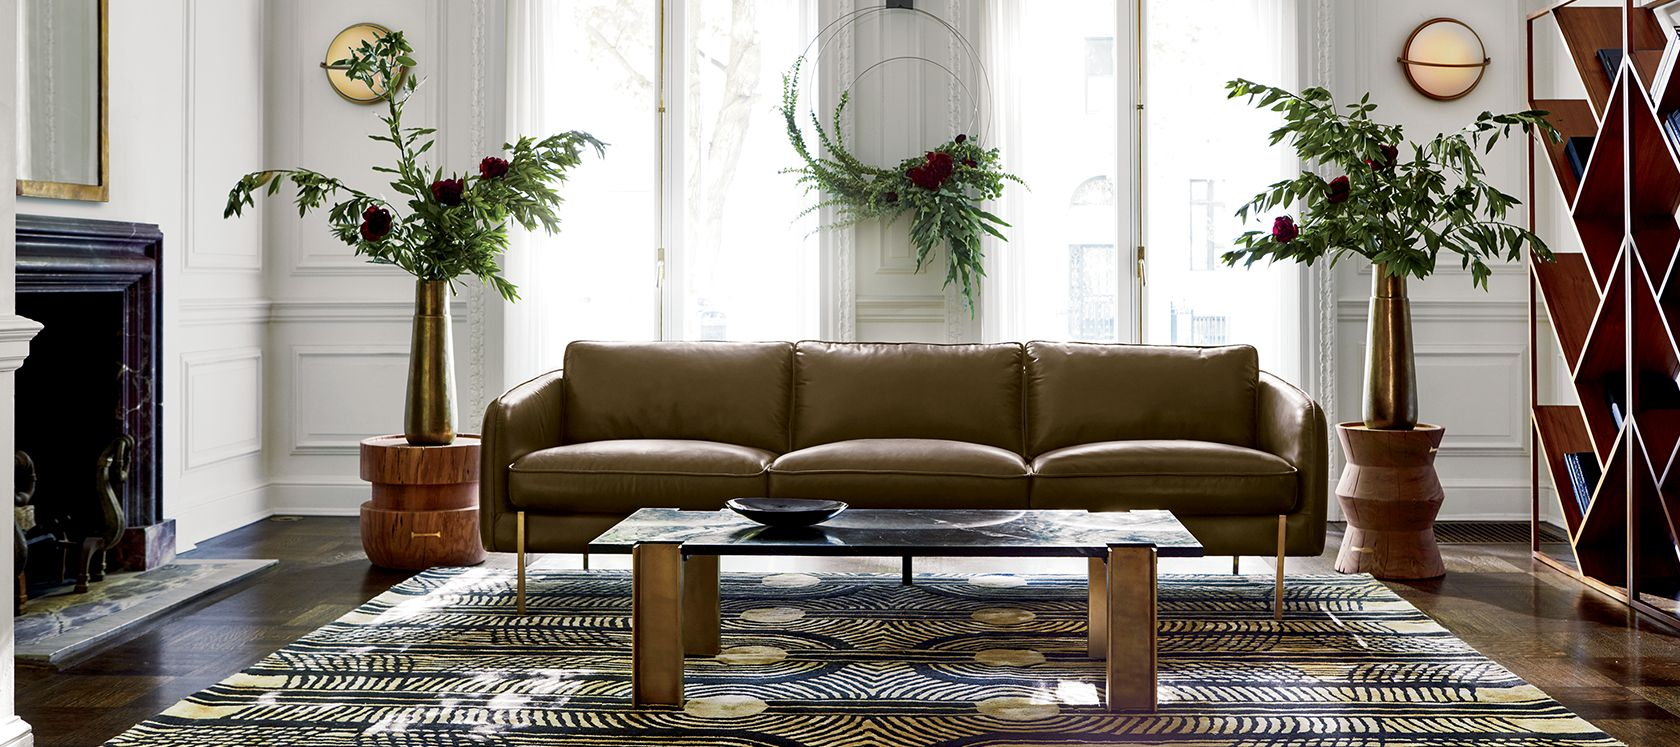 Design Shop All Furniture